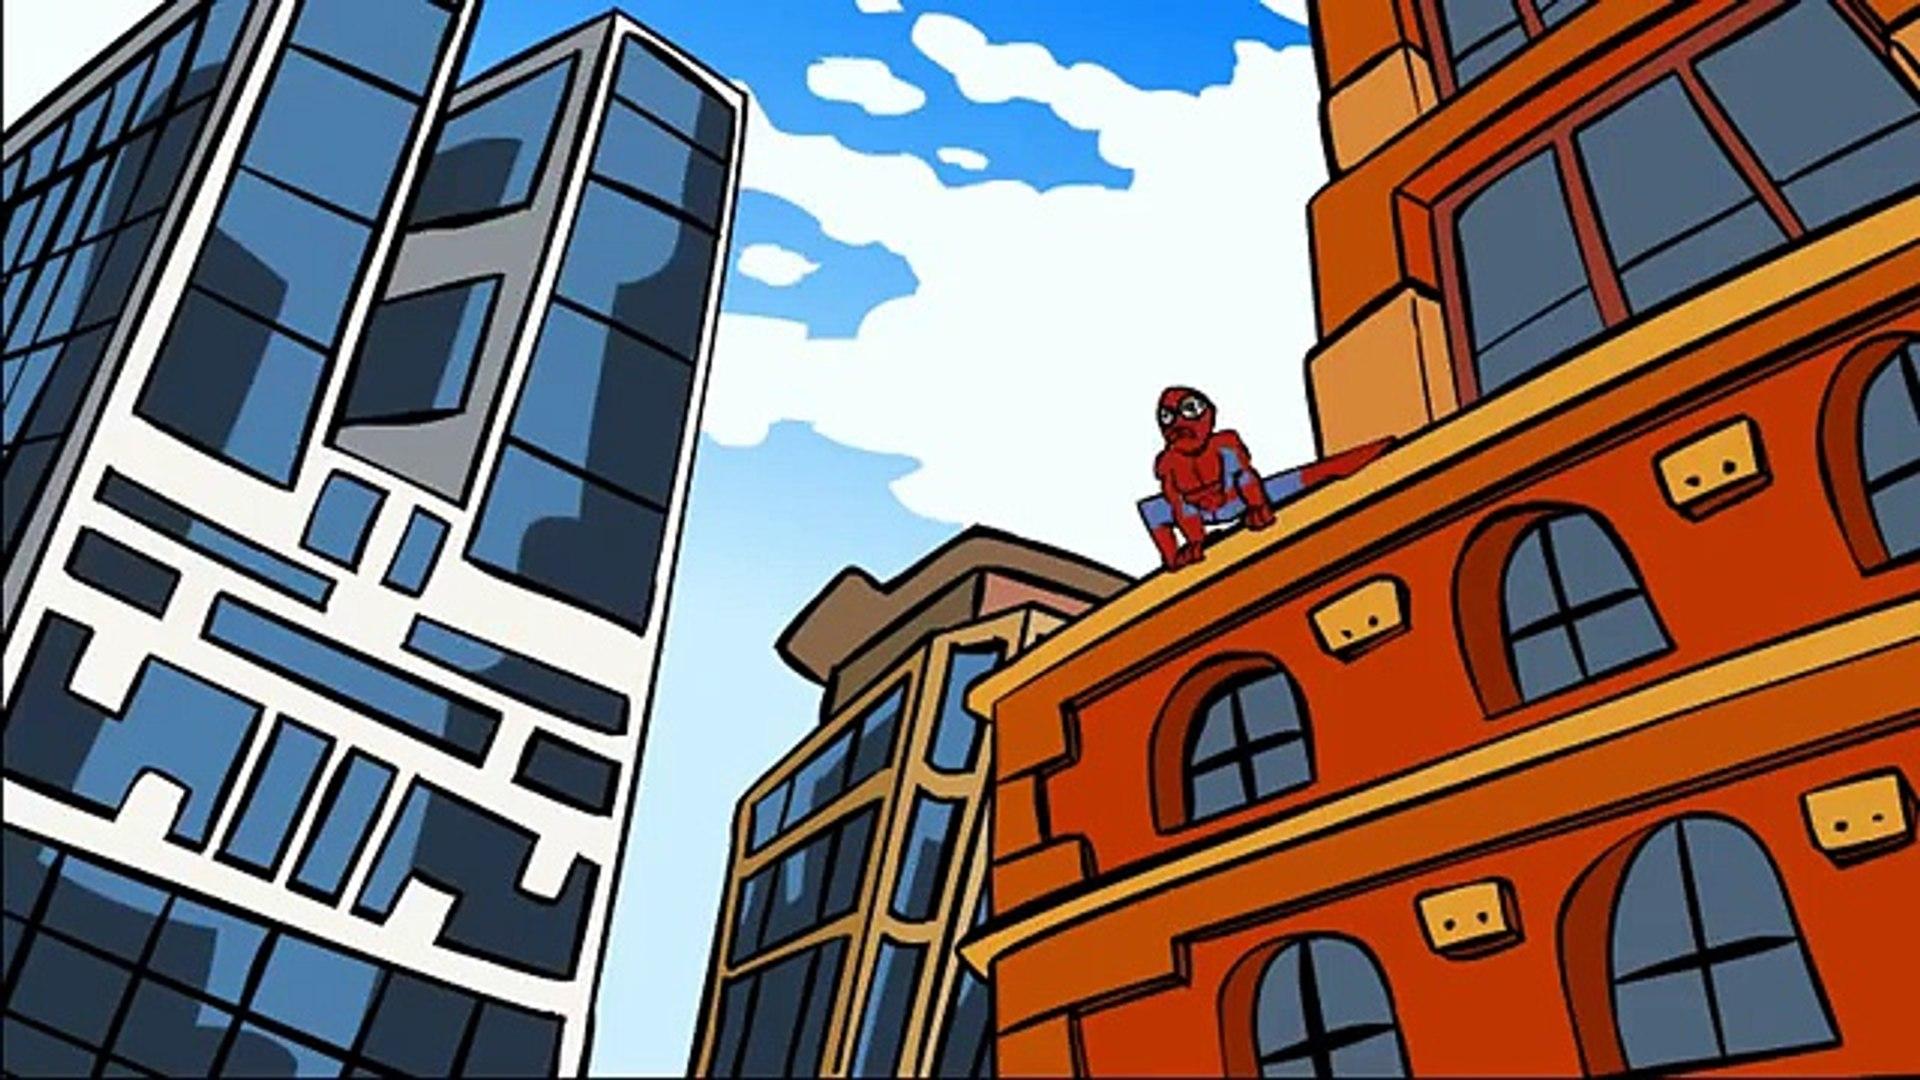 The Amazing Spiderman parody (Spider man parody cartoon)